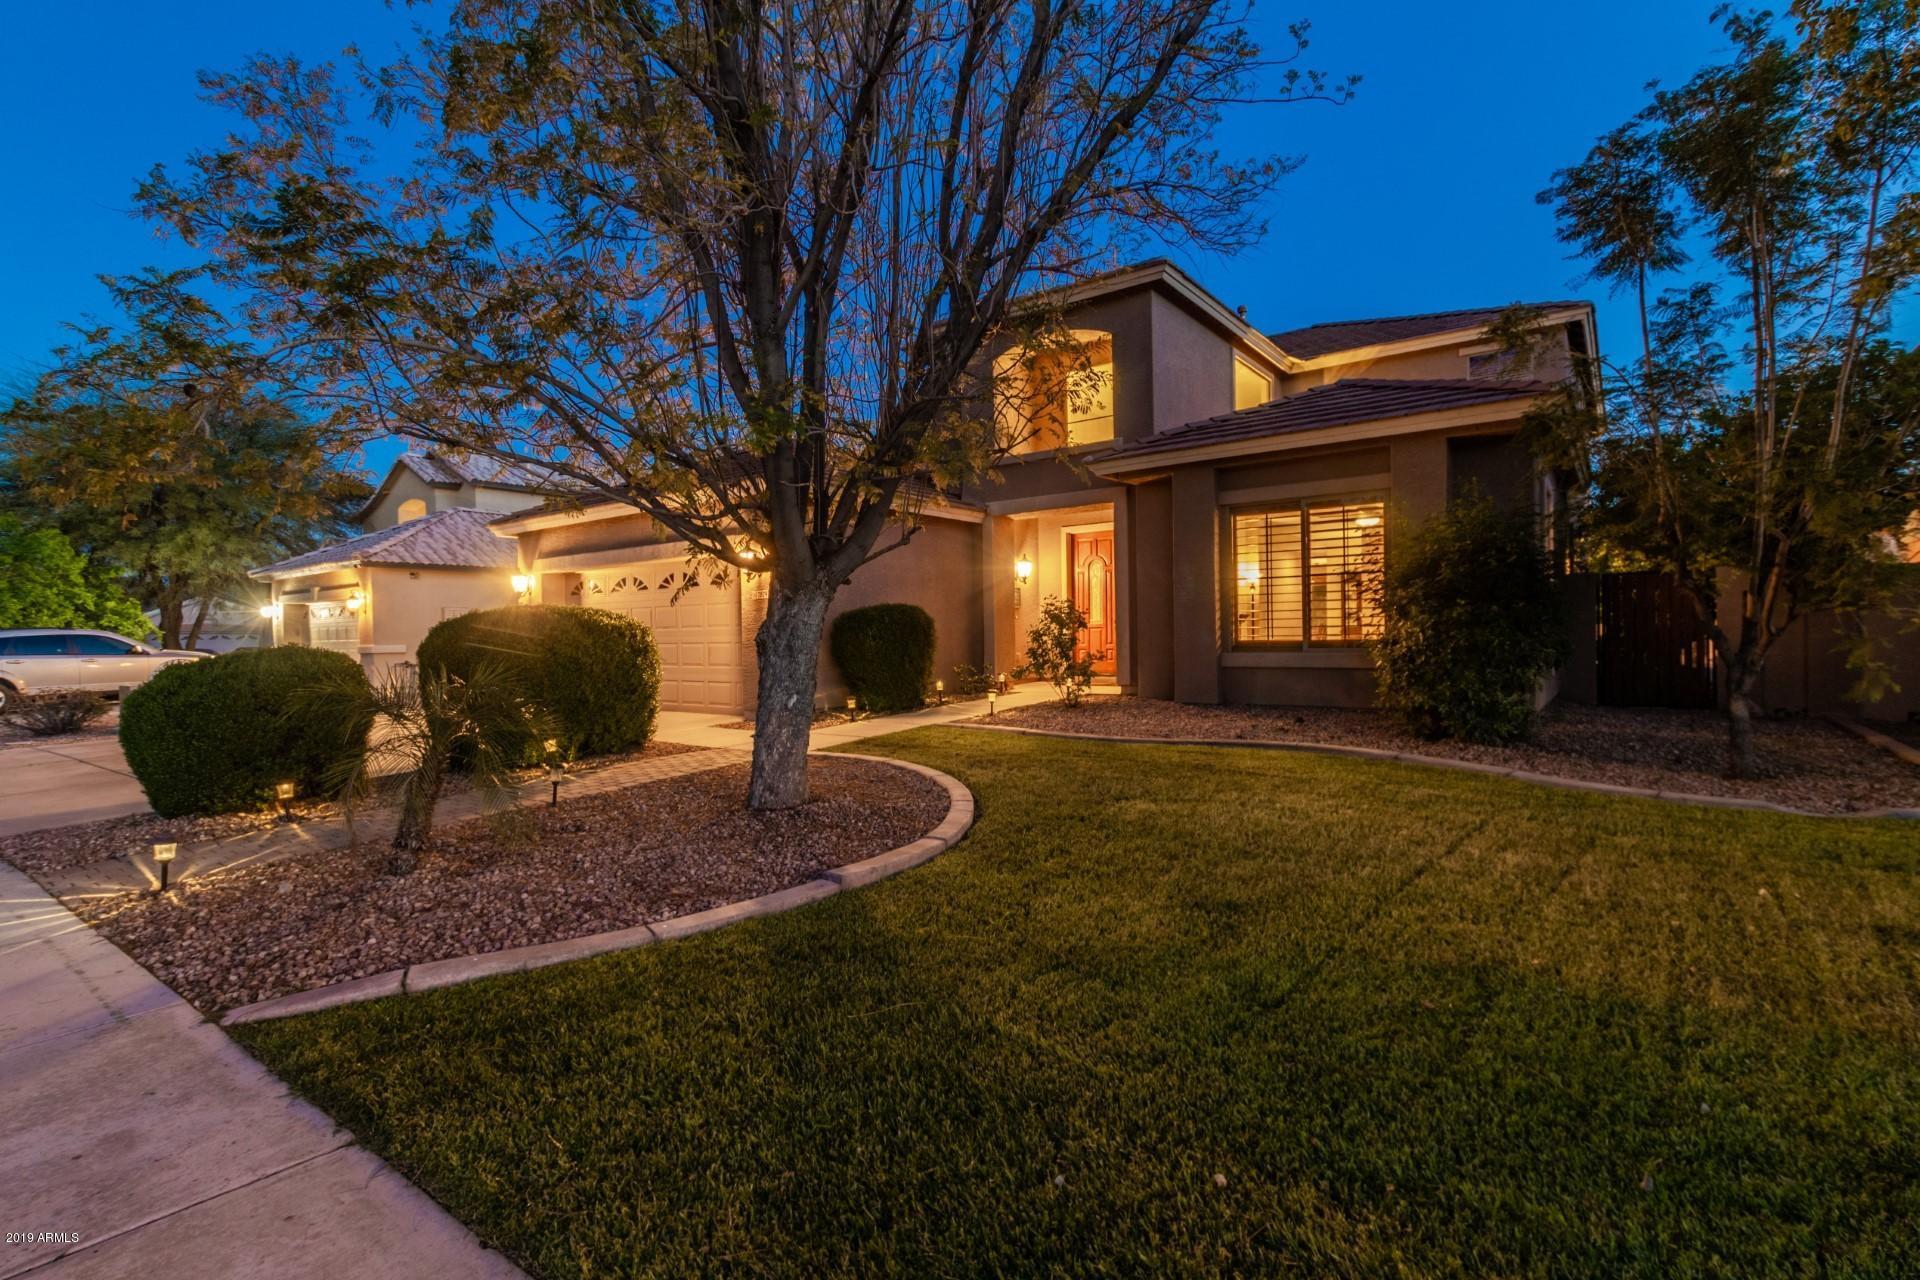 7879 W Melinda Lane, Peoria, Arizona